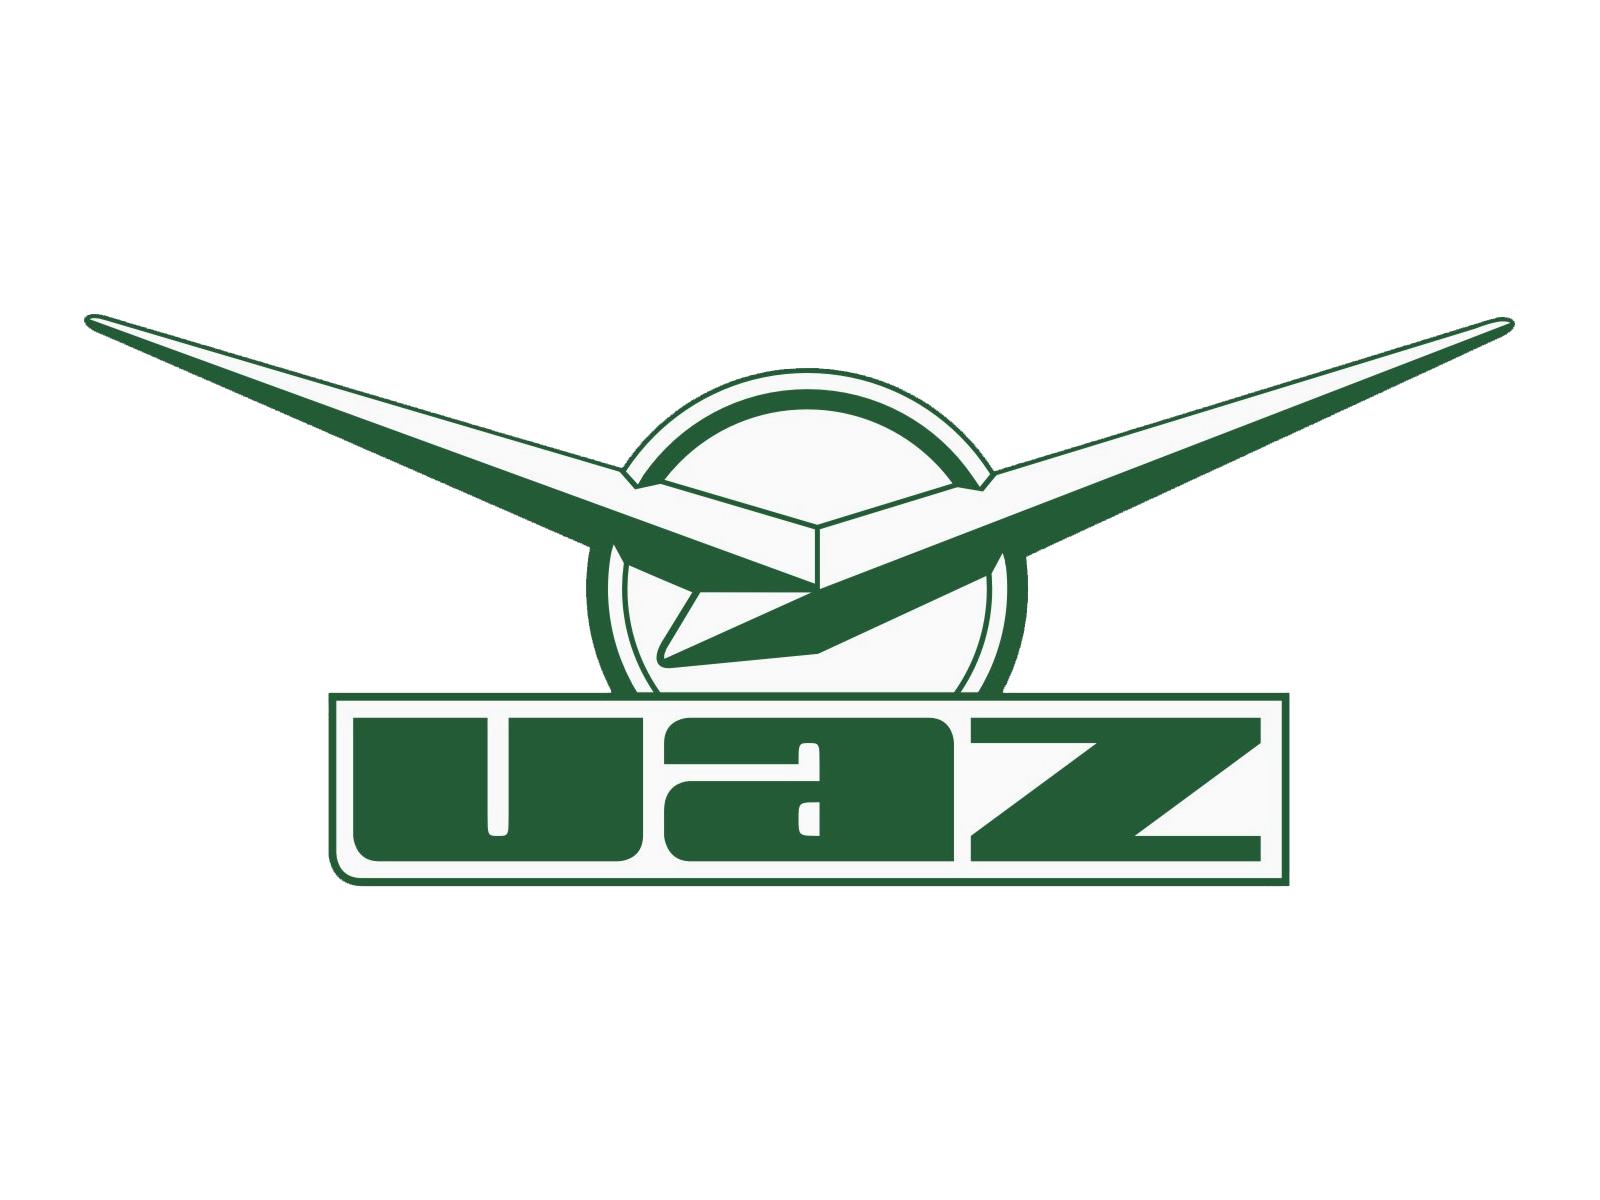 Стало известно название конкурента «Газели» отУАЗ